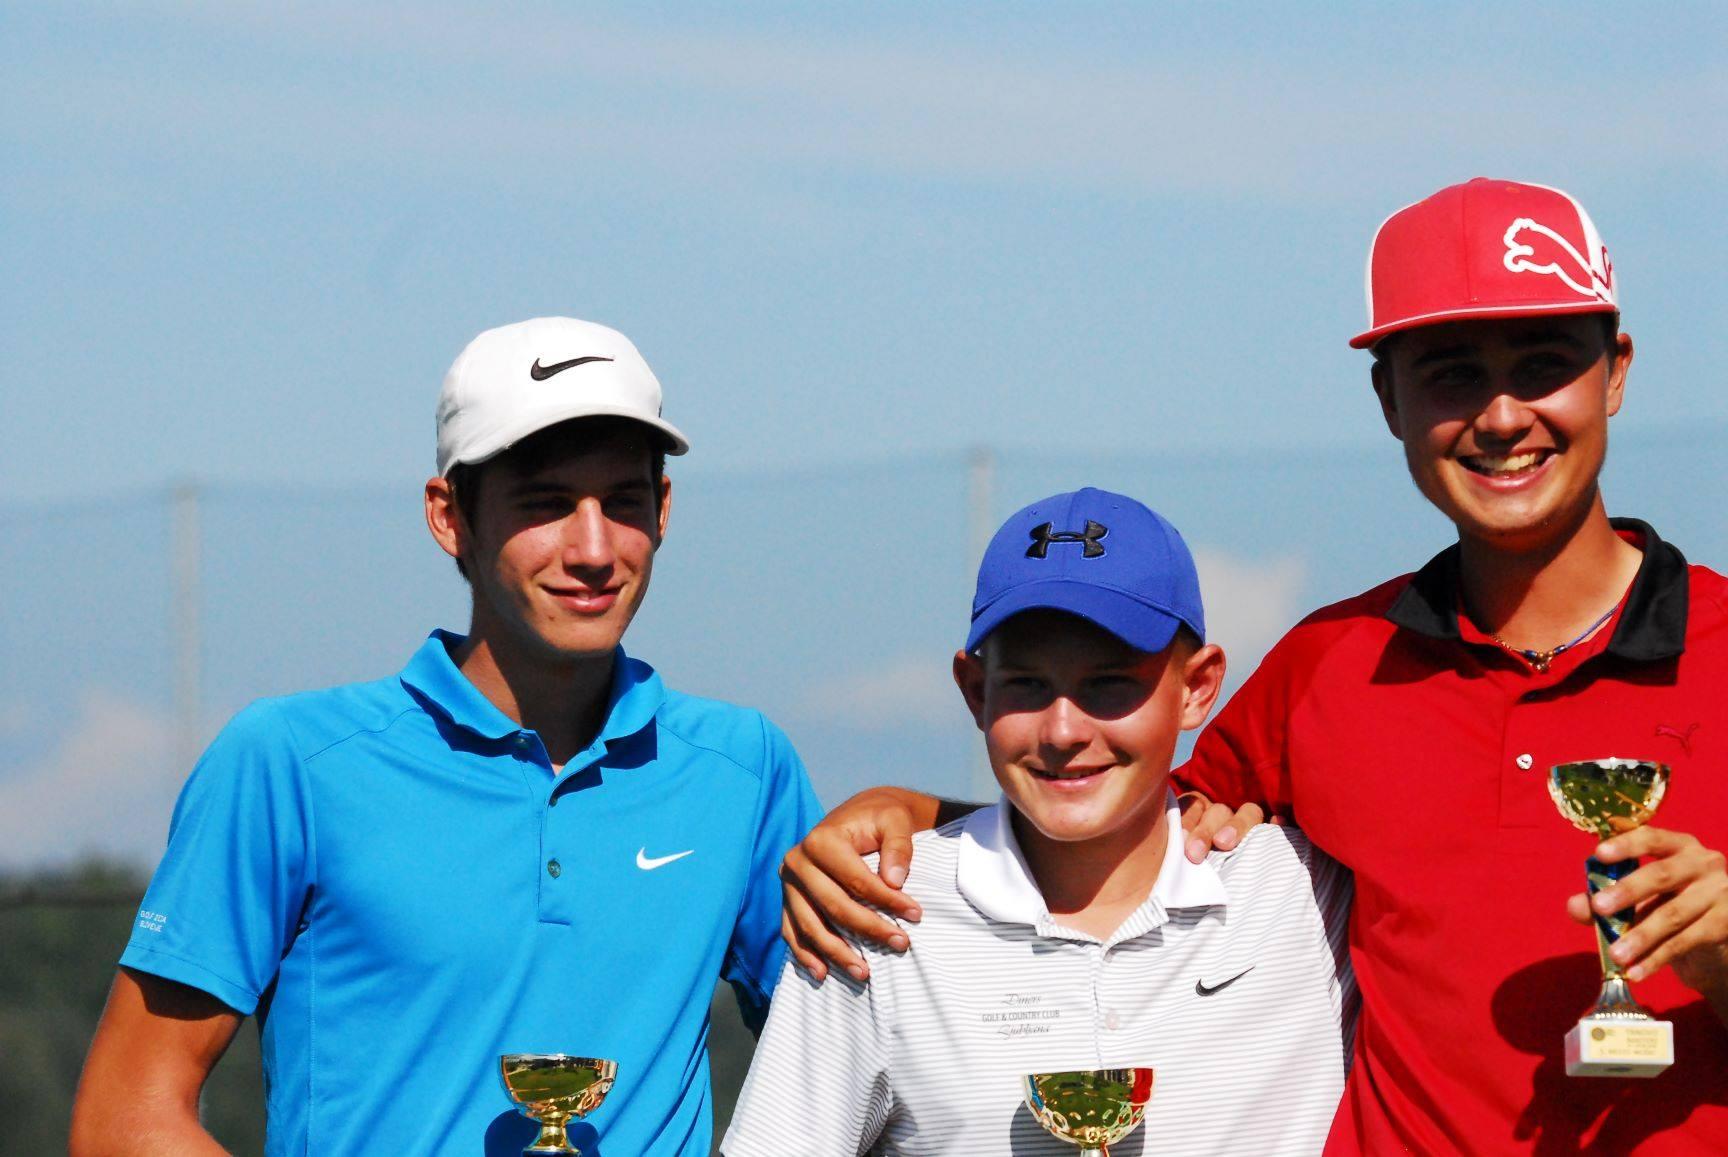 Trnovo masters 2018